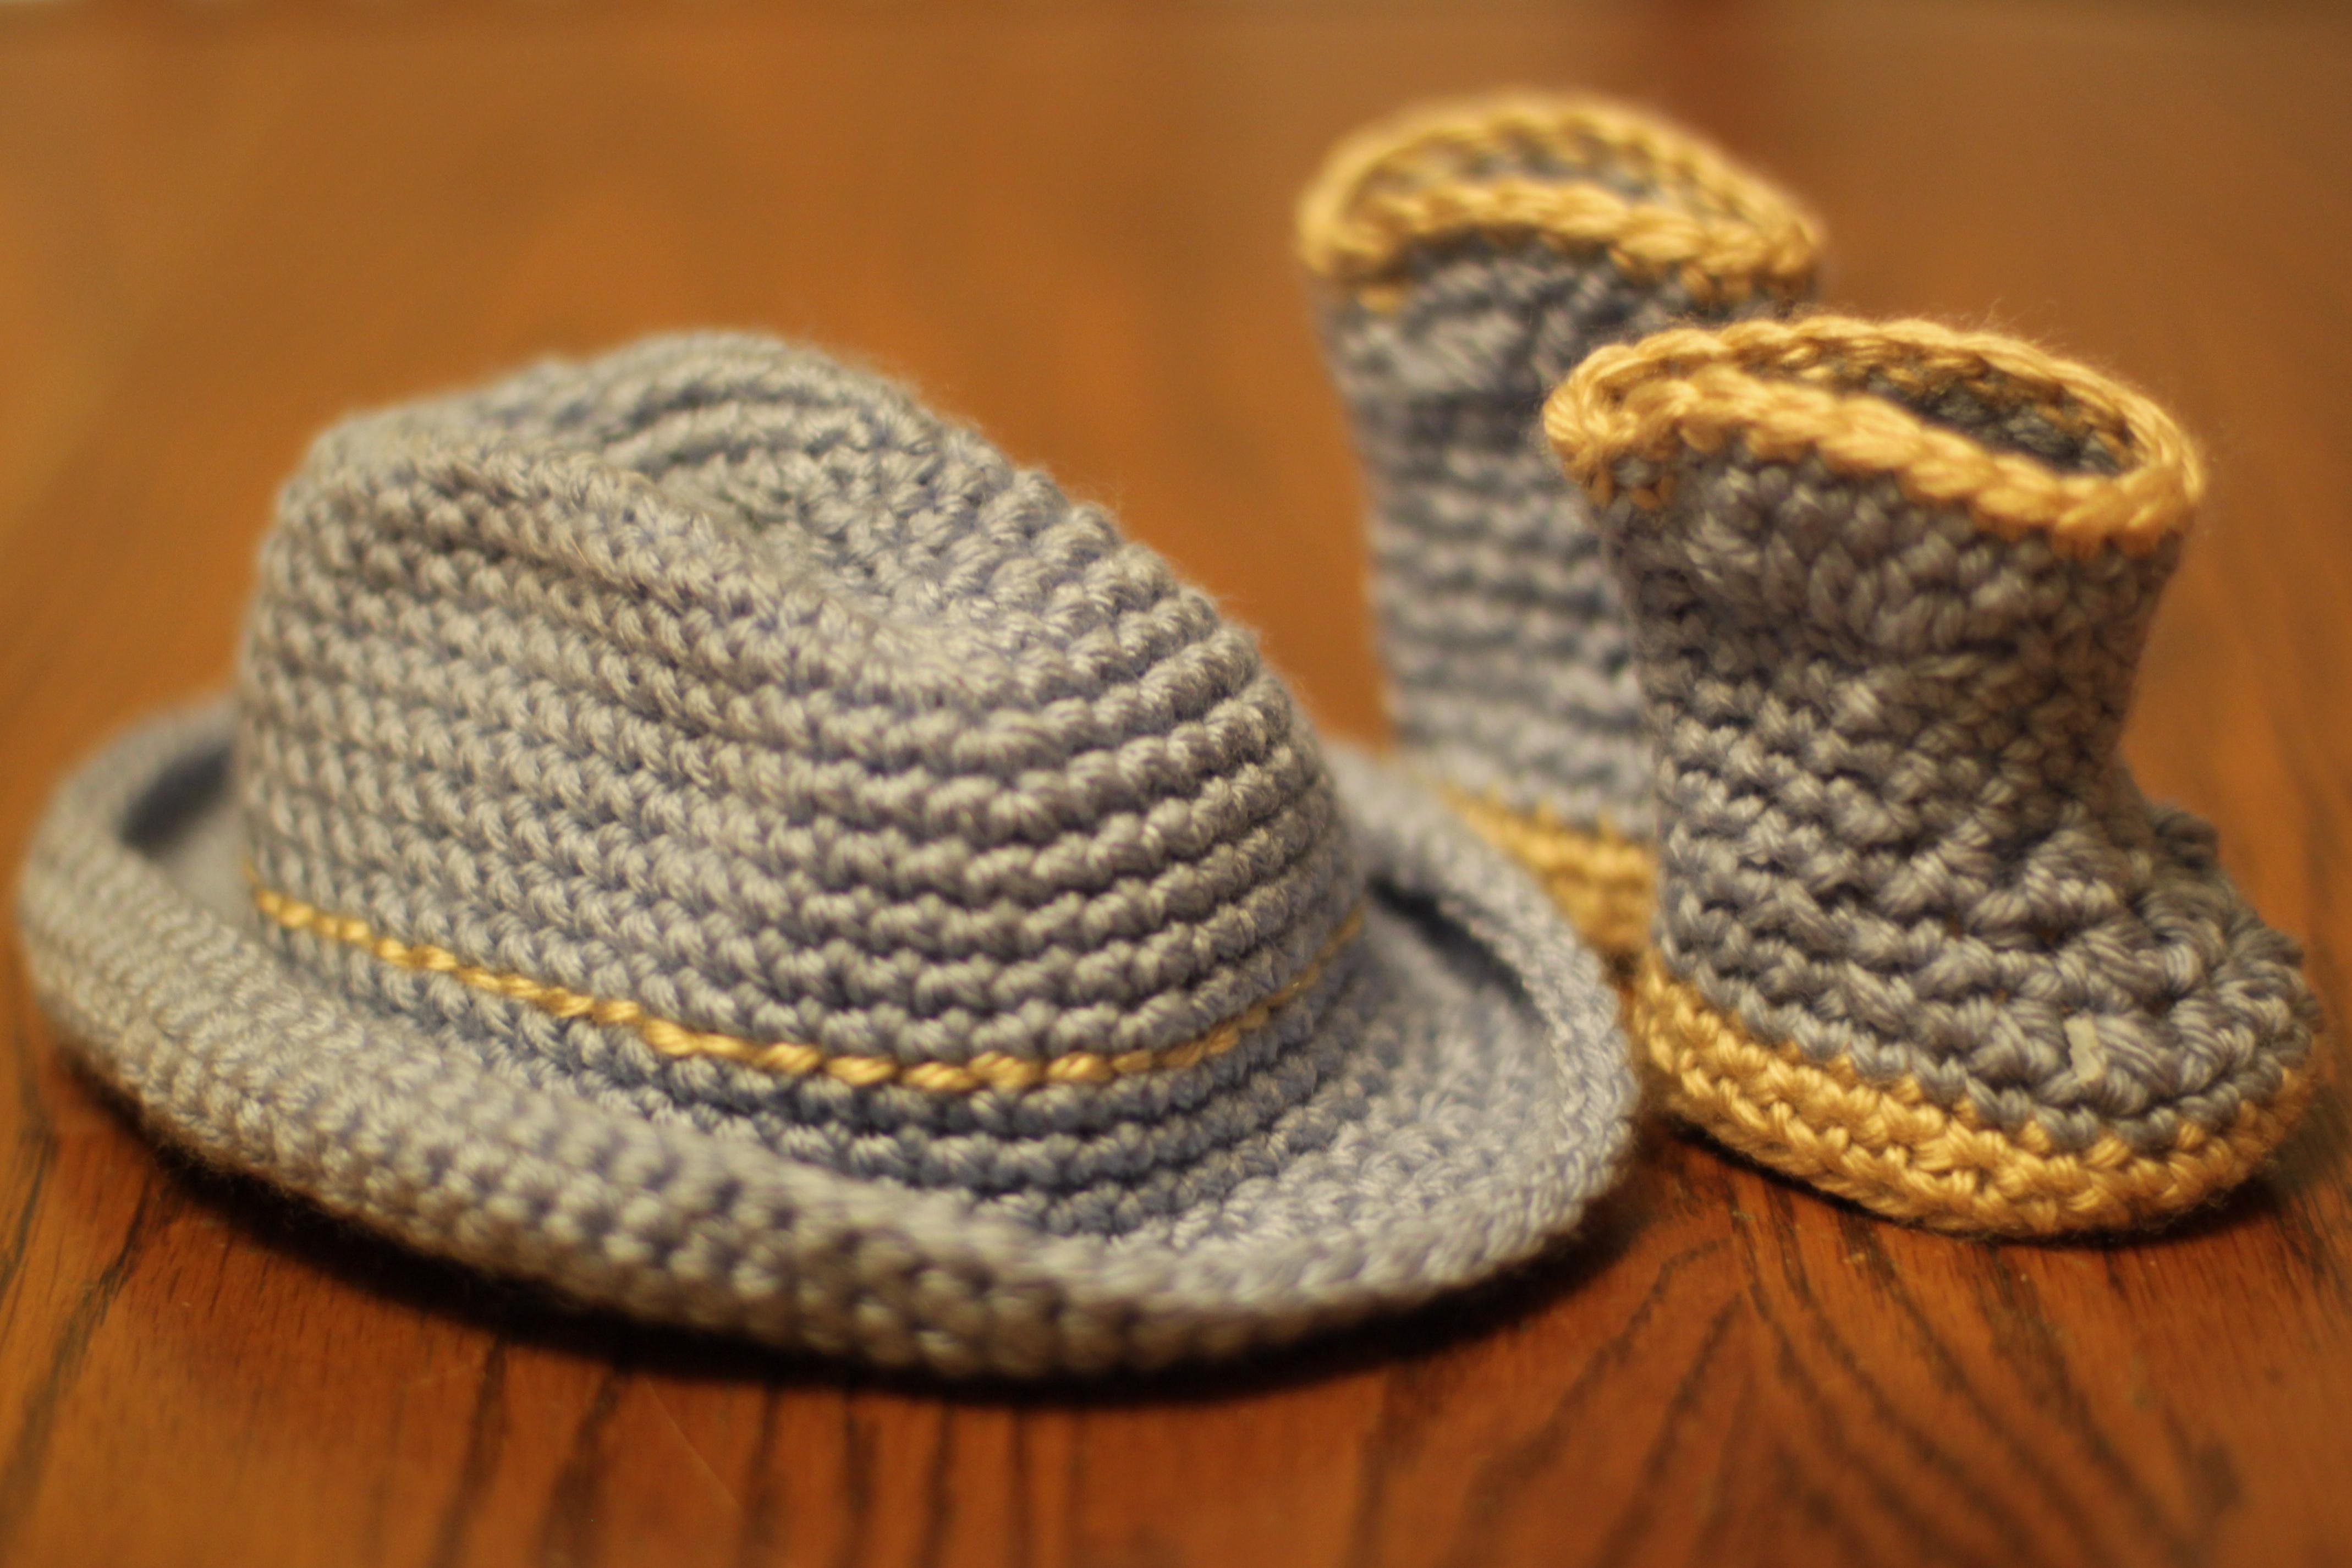 Crochet Hats for American Girl Dolls & Their Girls | bonnyknits